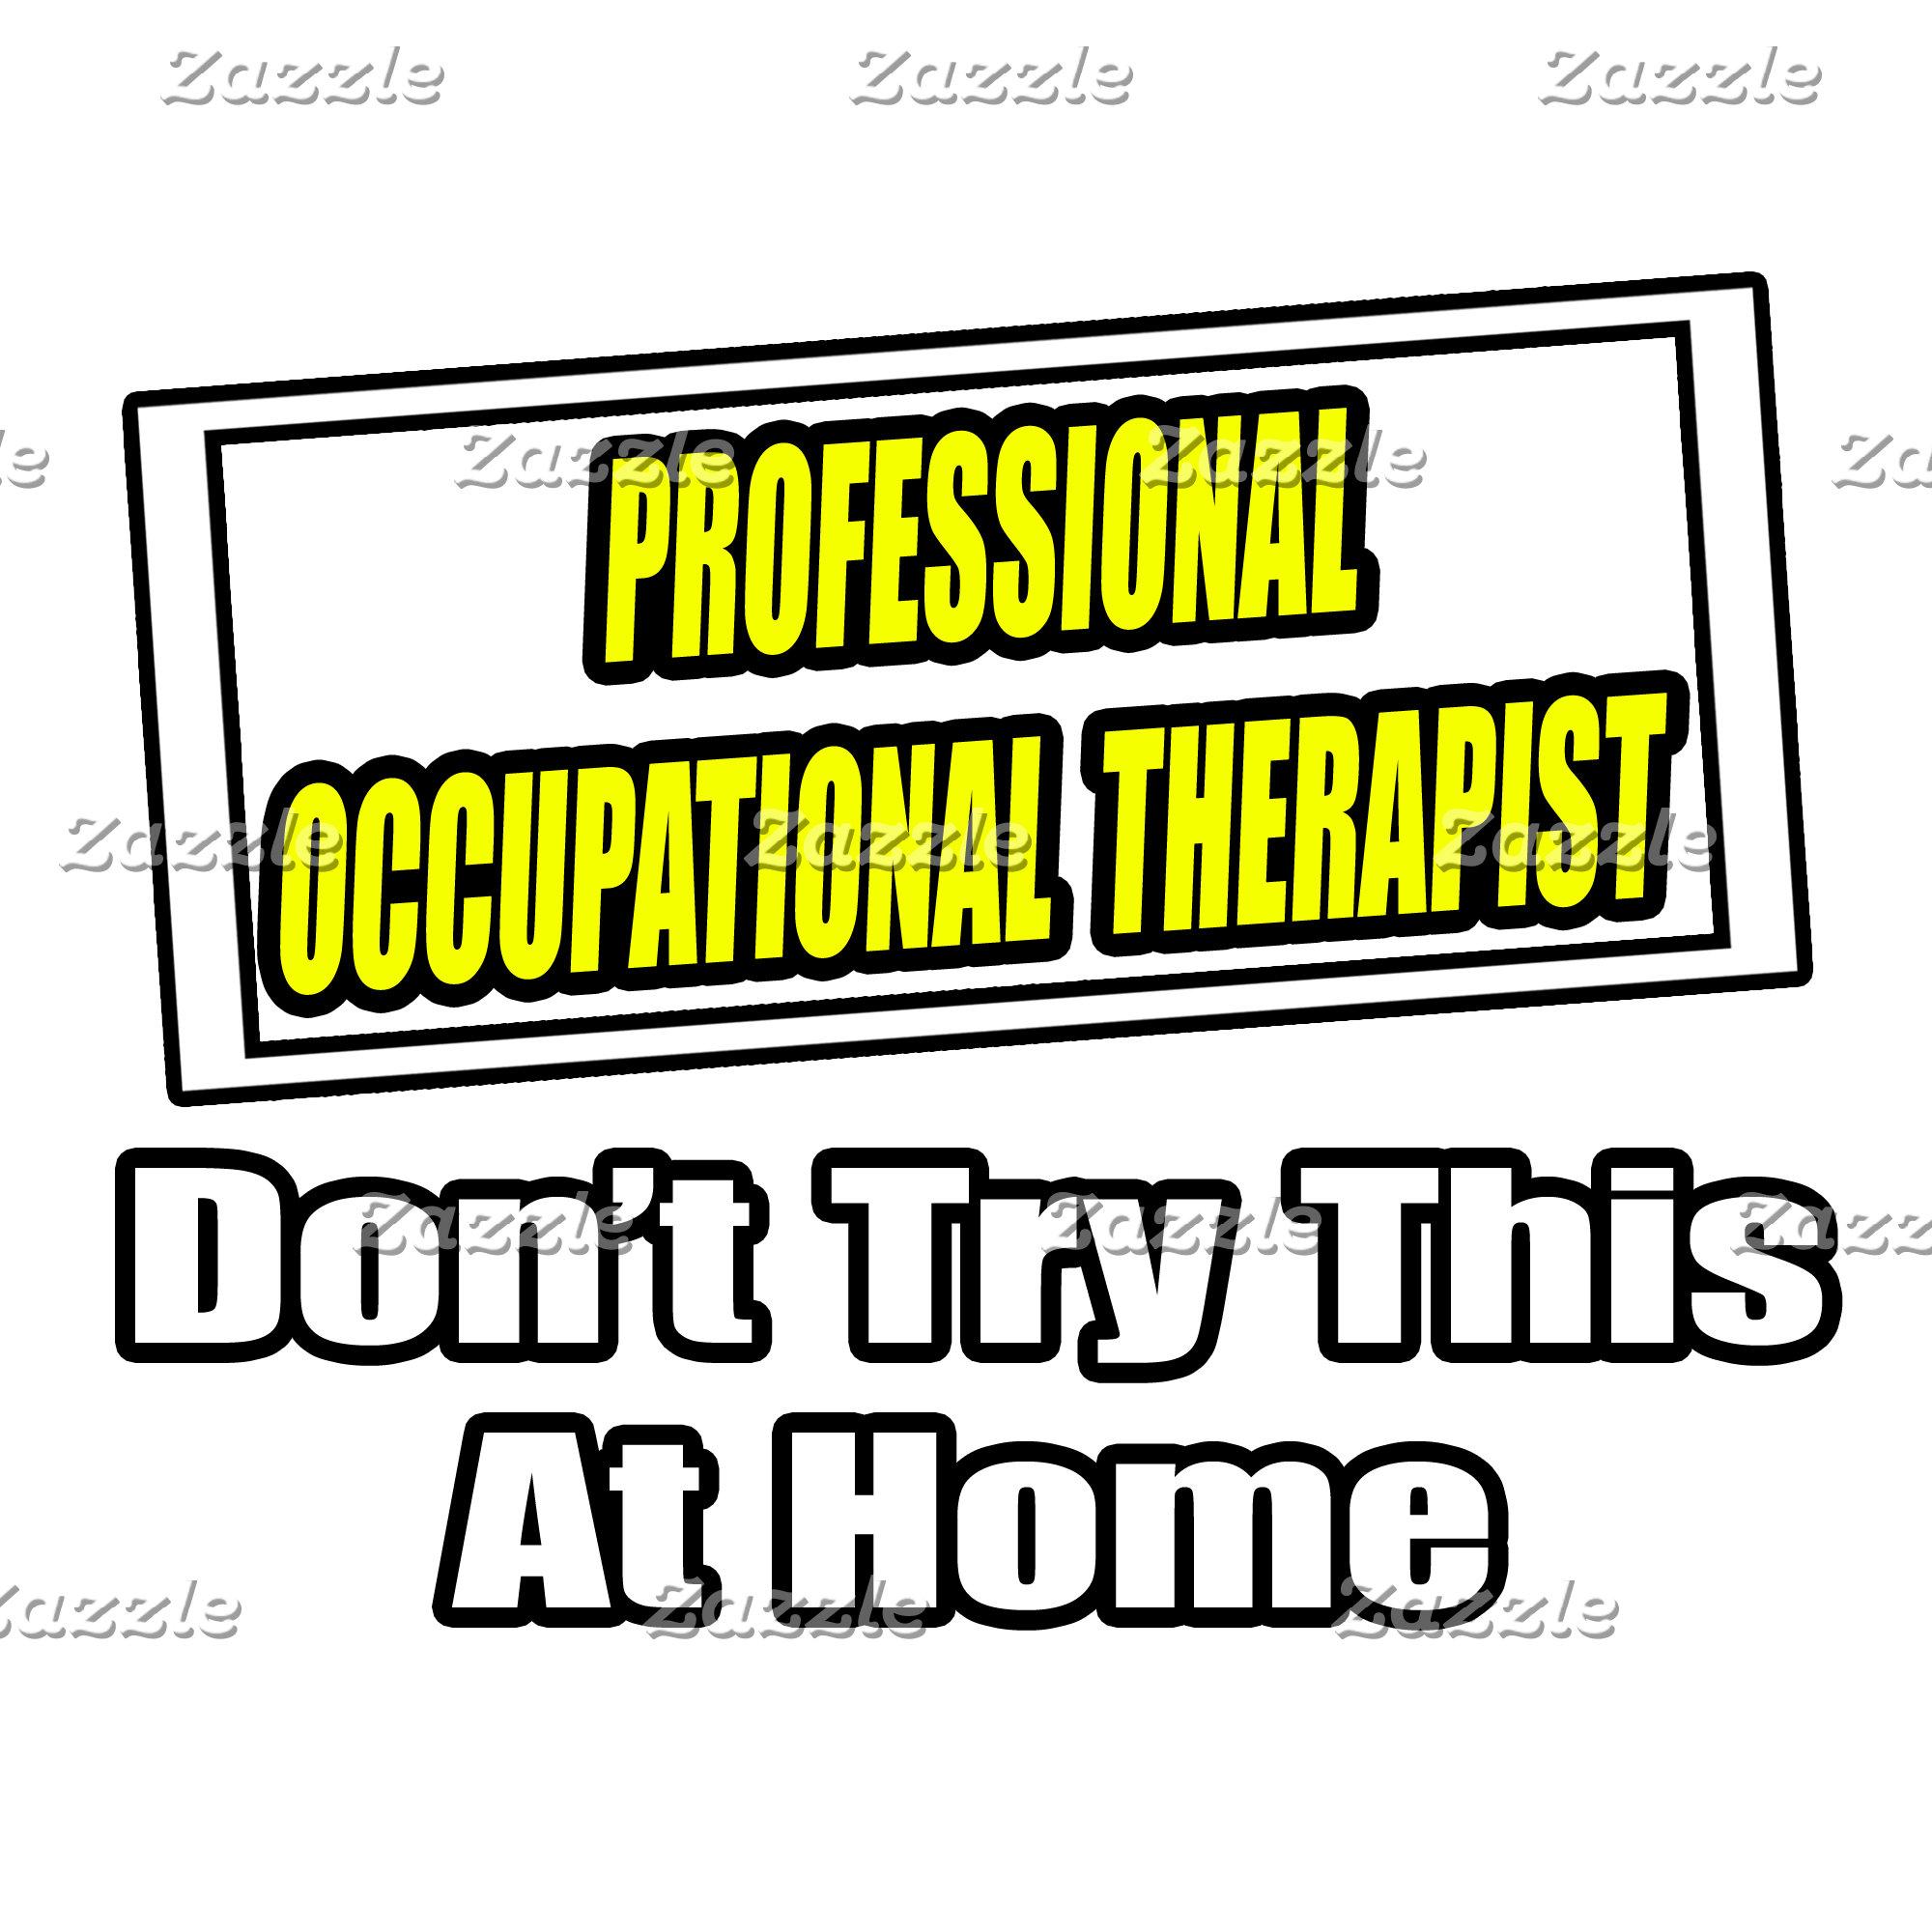 Professional Occupational Therapist...Joke